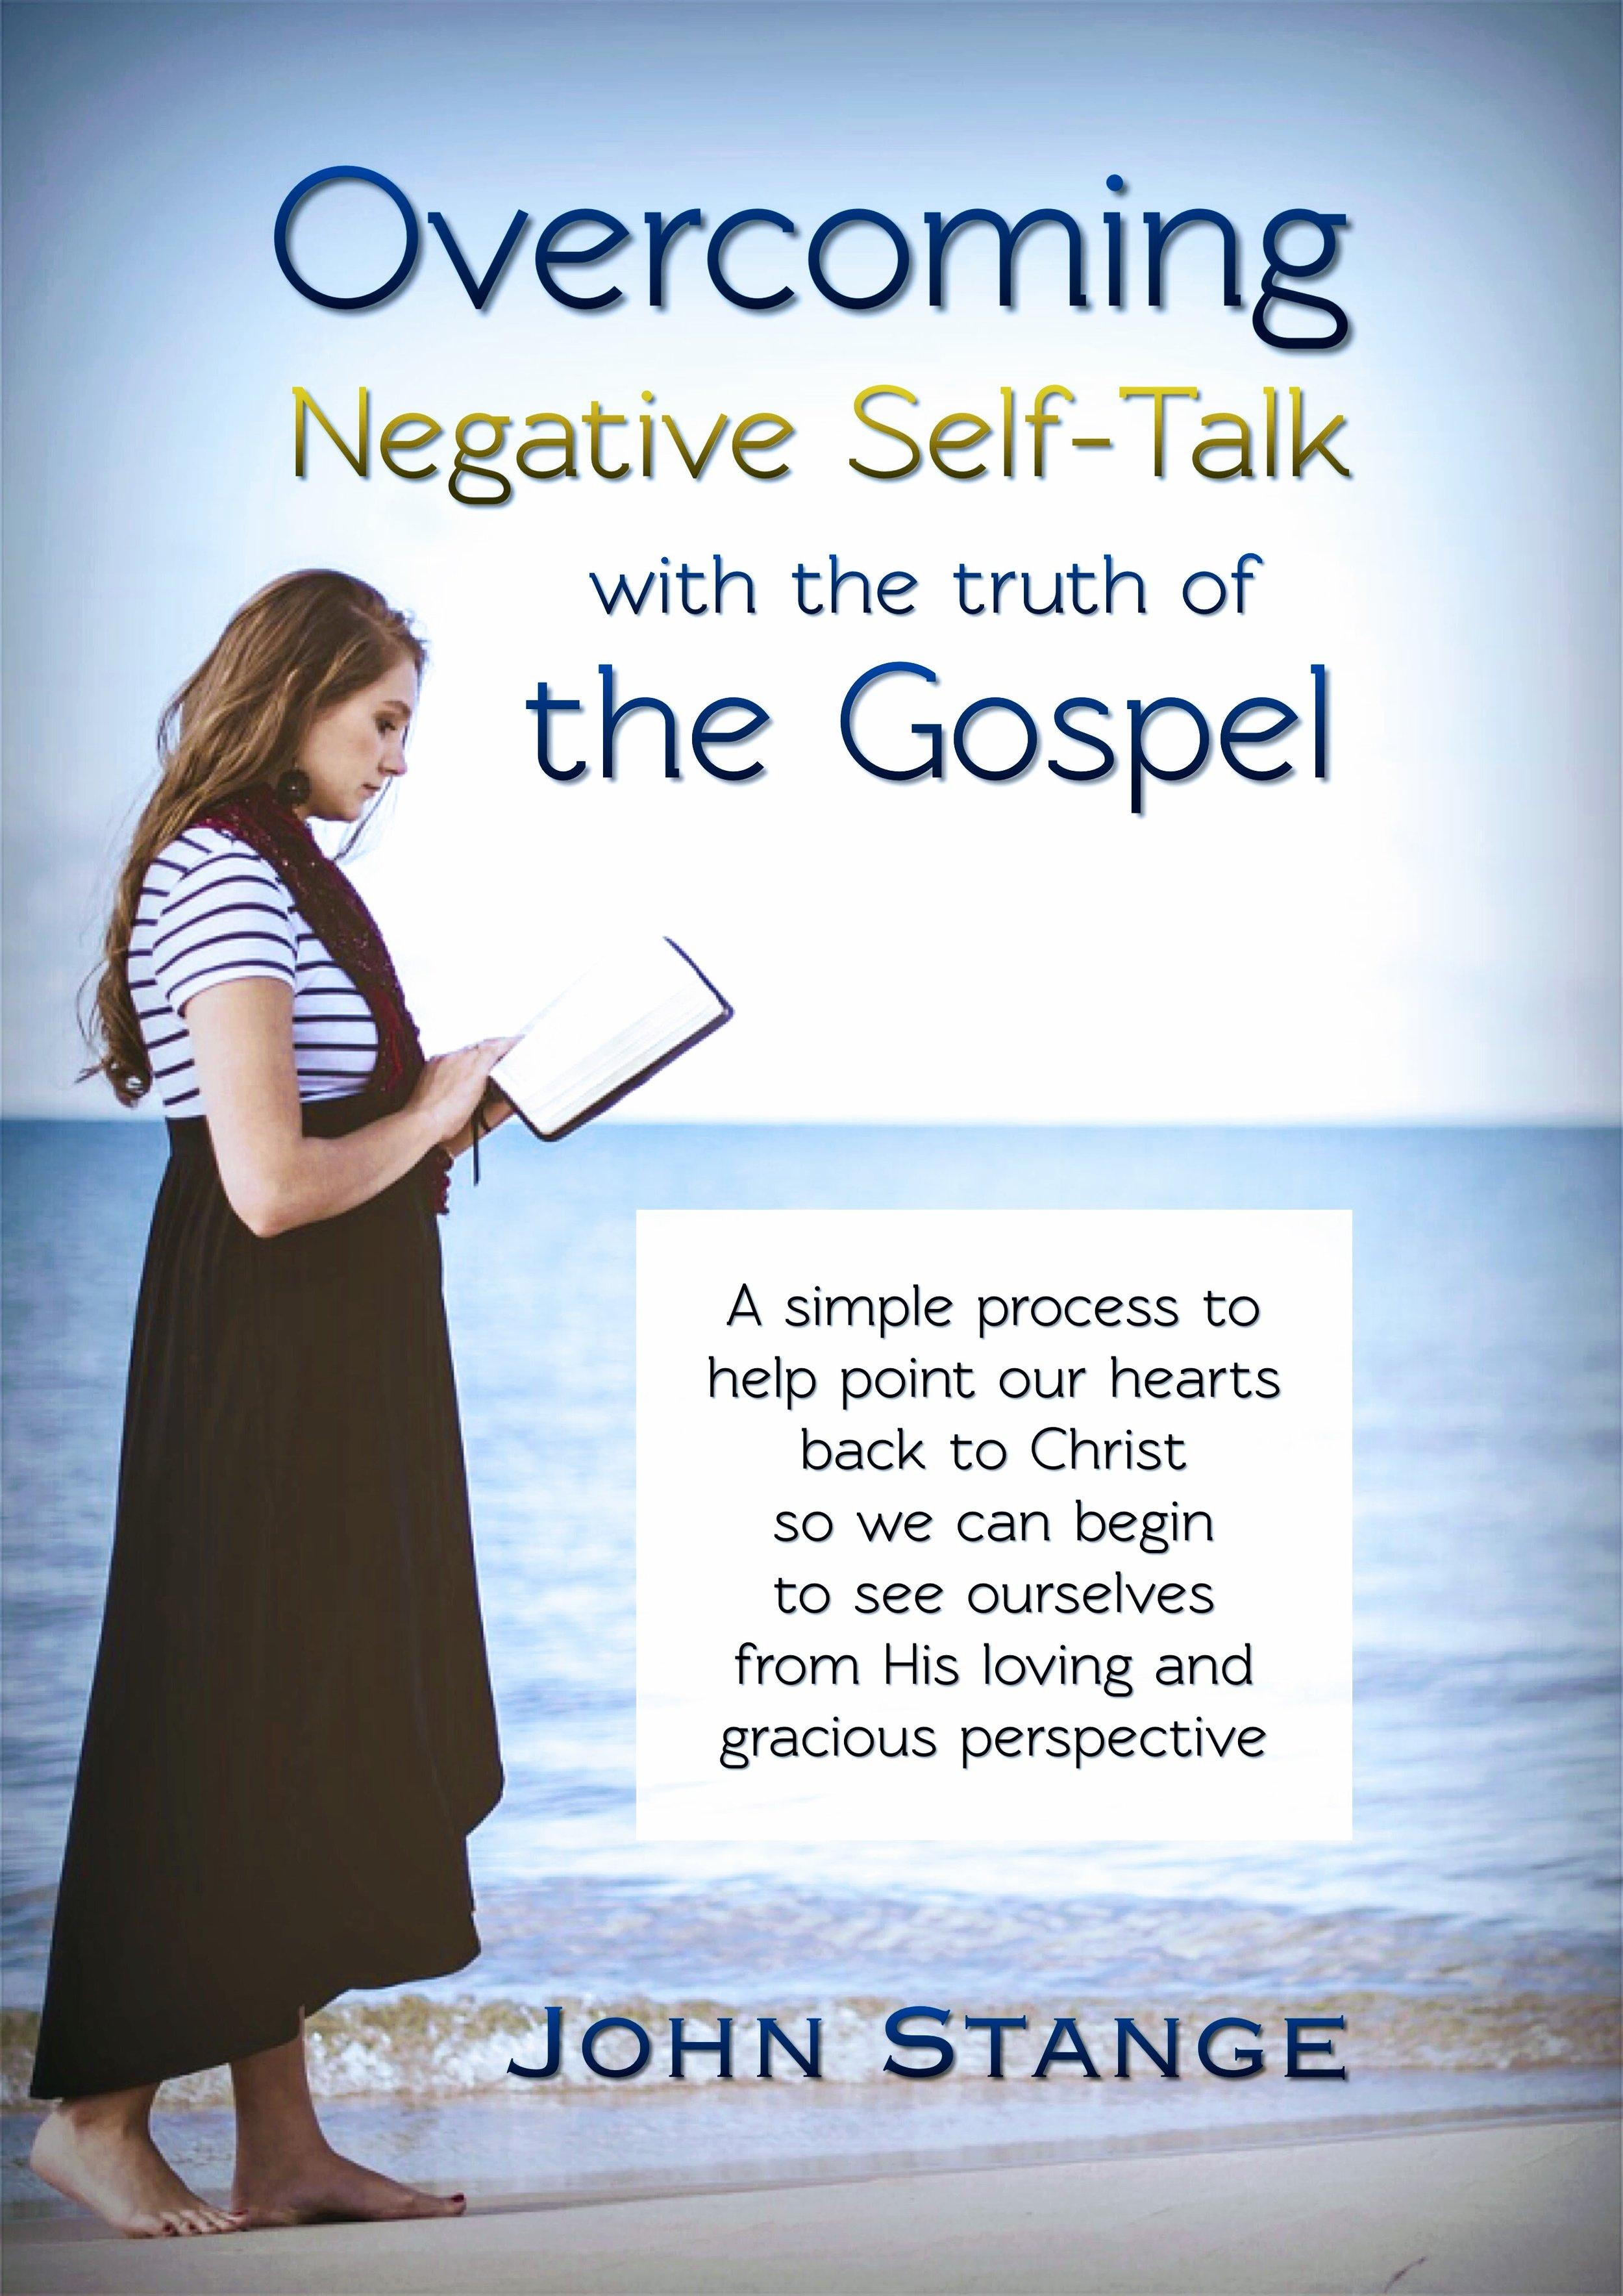 Overcoming Negative Self-Talk.JPG